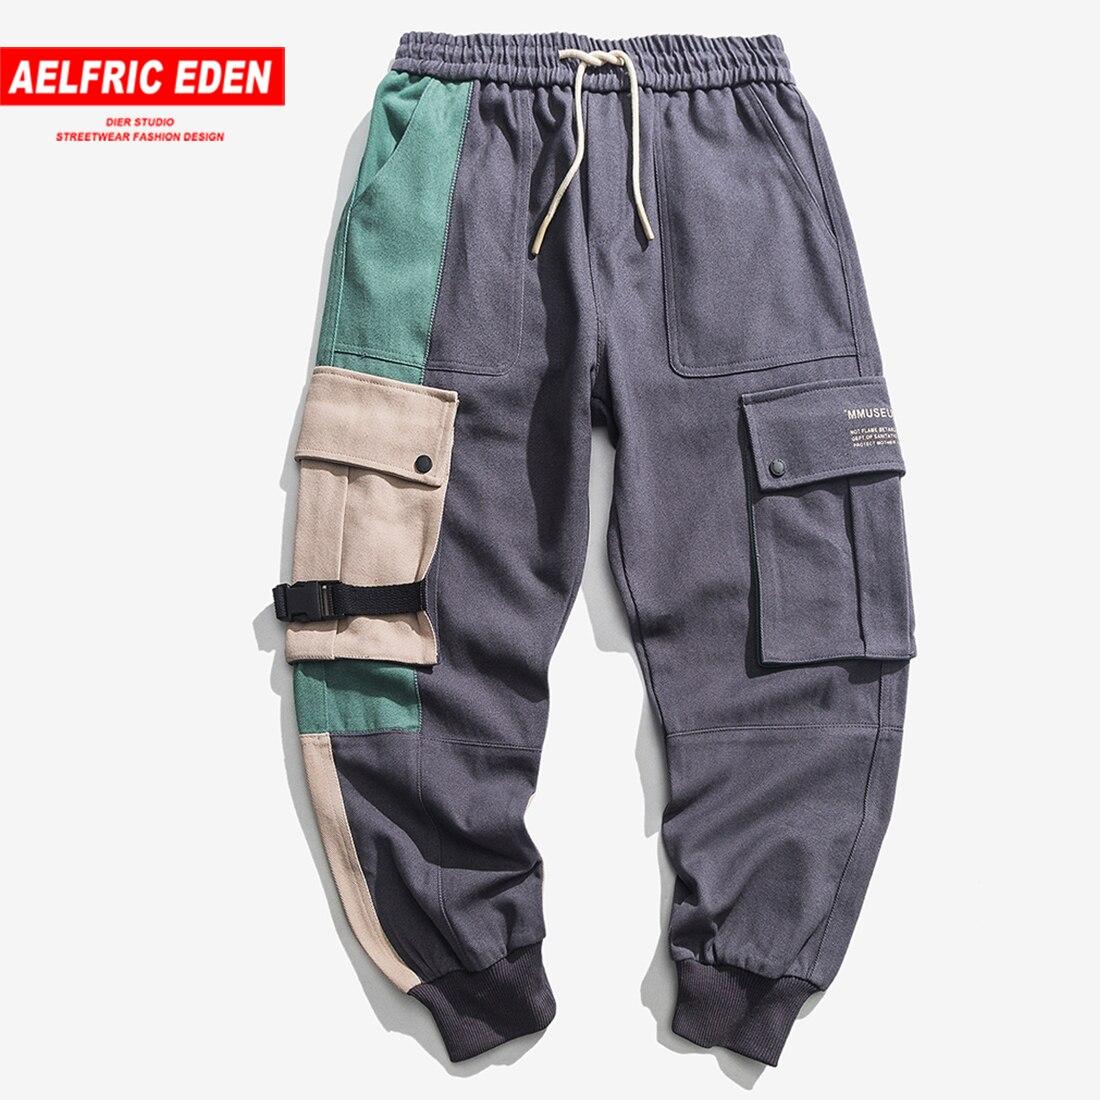 Aelfric Eden Marke Neue Hüfte Hop Cargo Hosen Highstreet Farbe Block Kontrast Jogginghose Regelmäßige Kordelzug Männer Jogger Streetwear